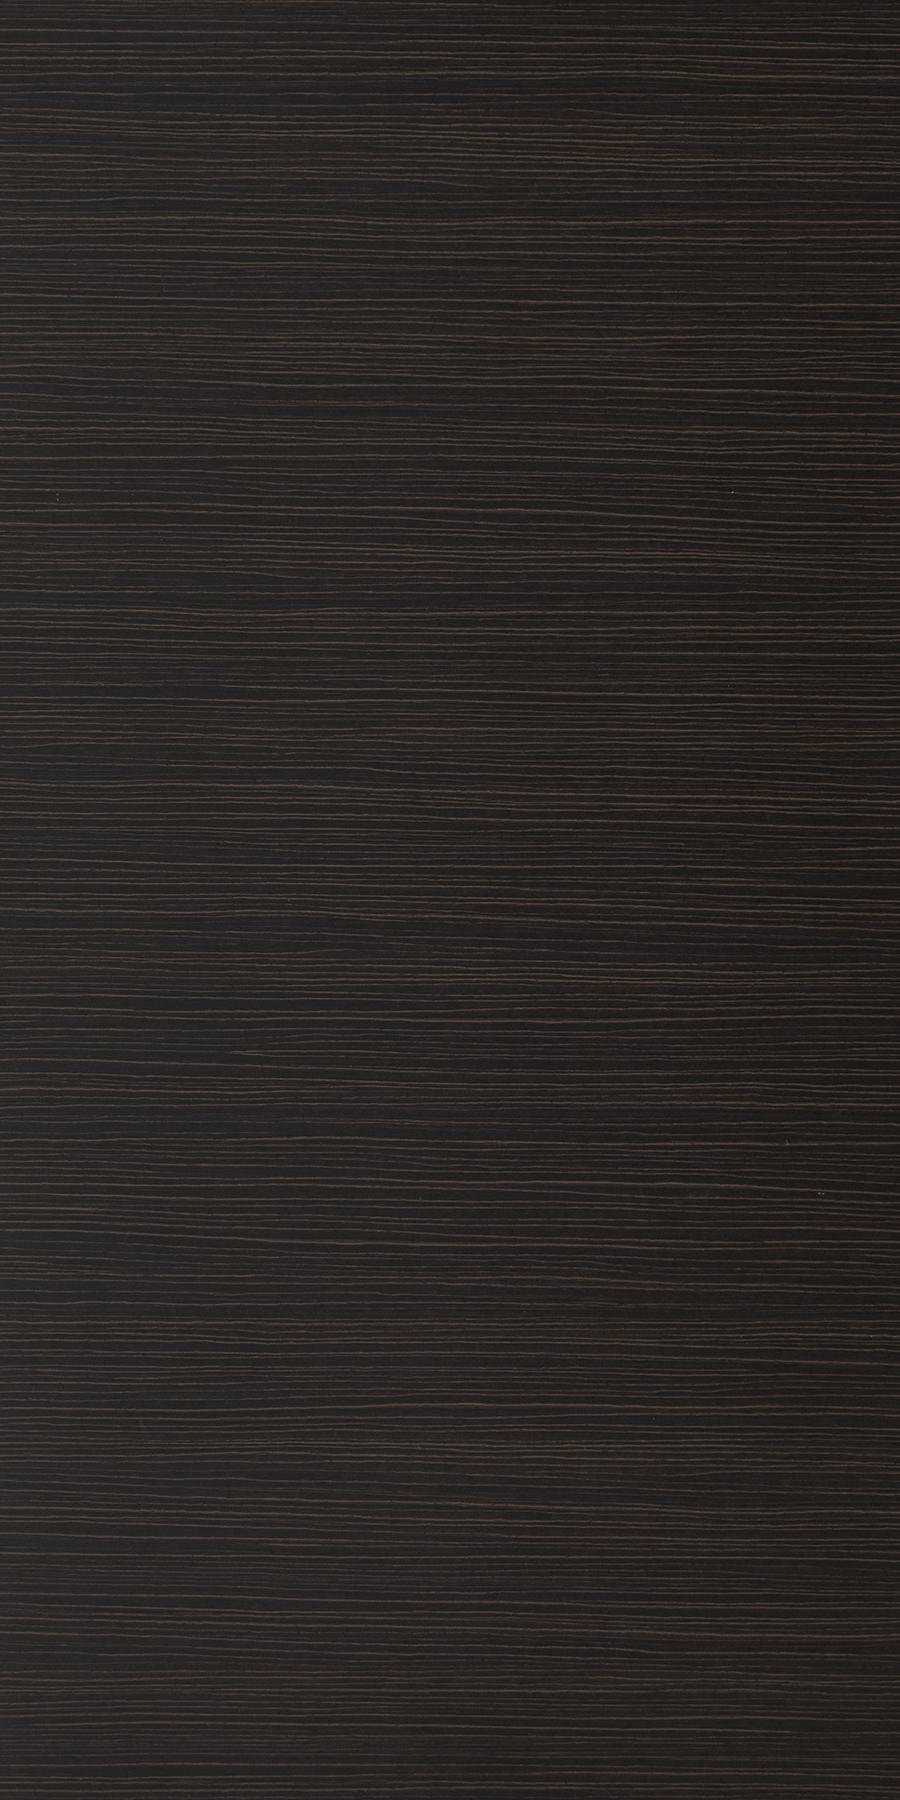 900×450